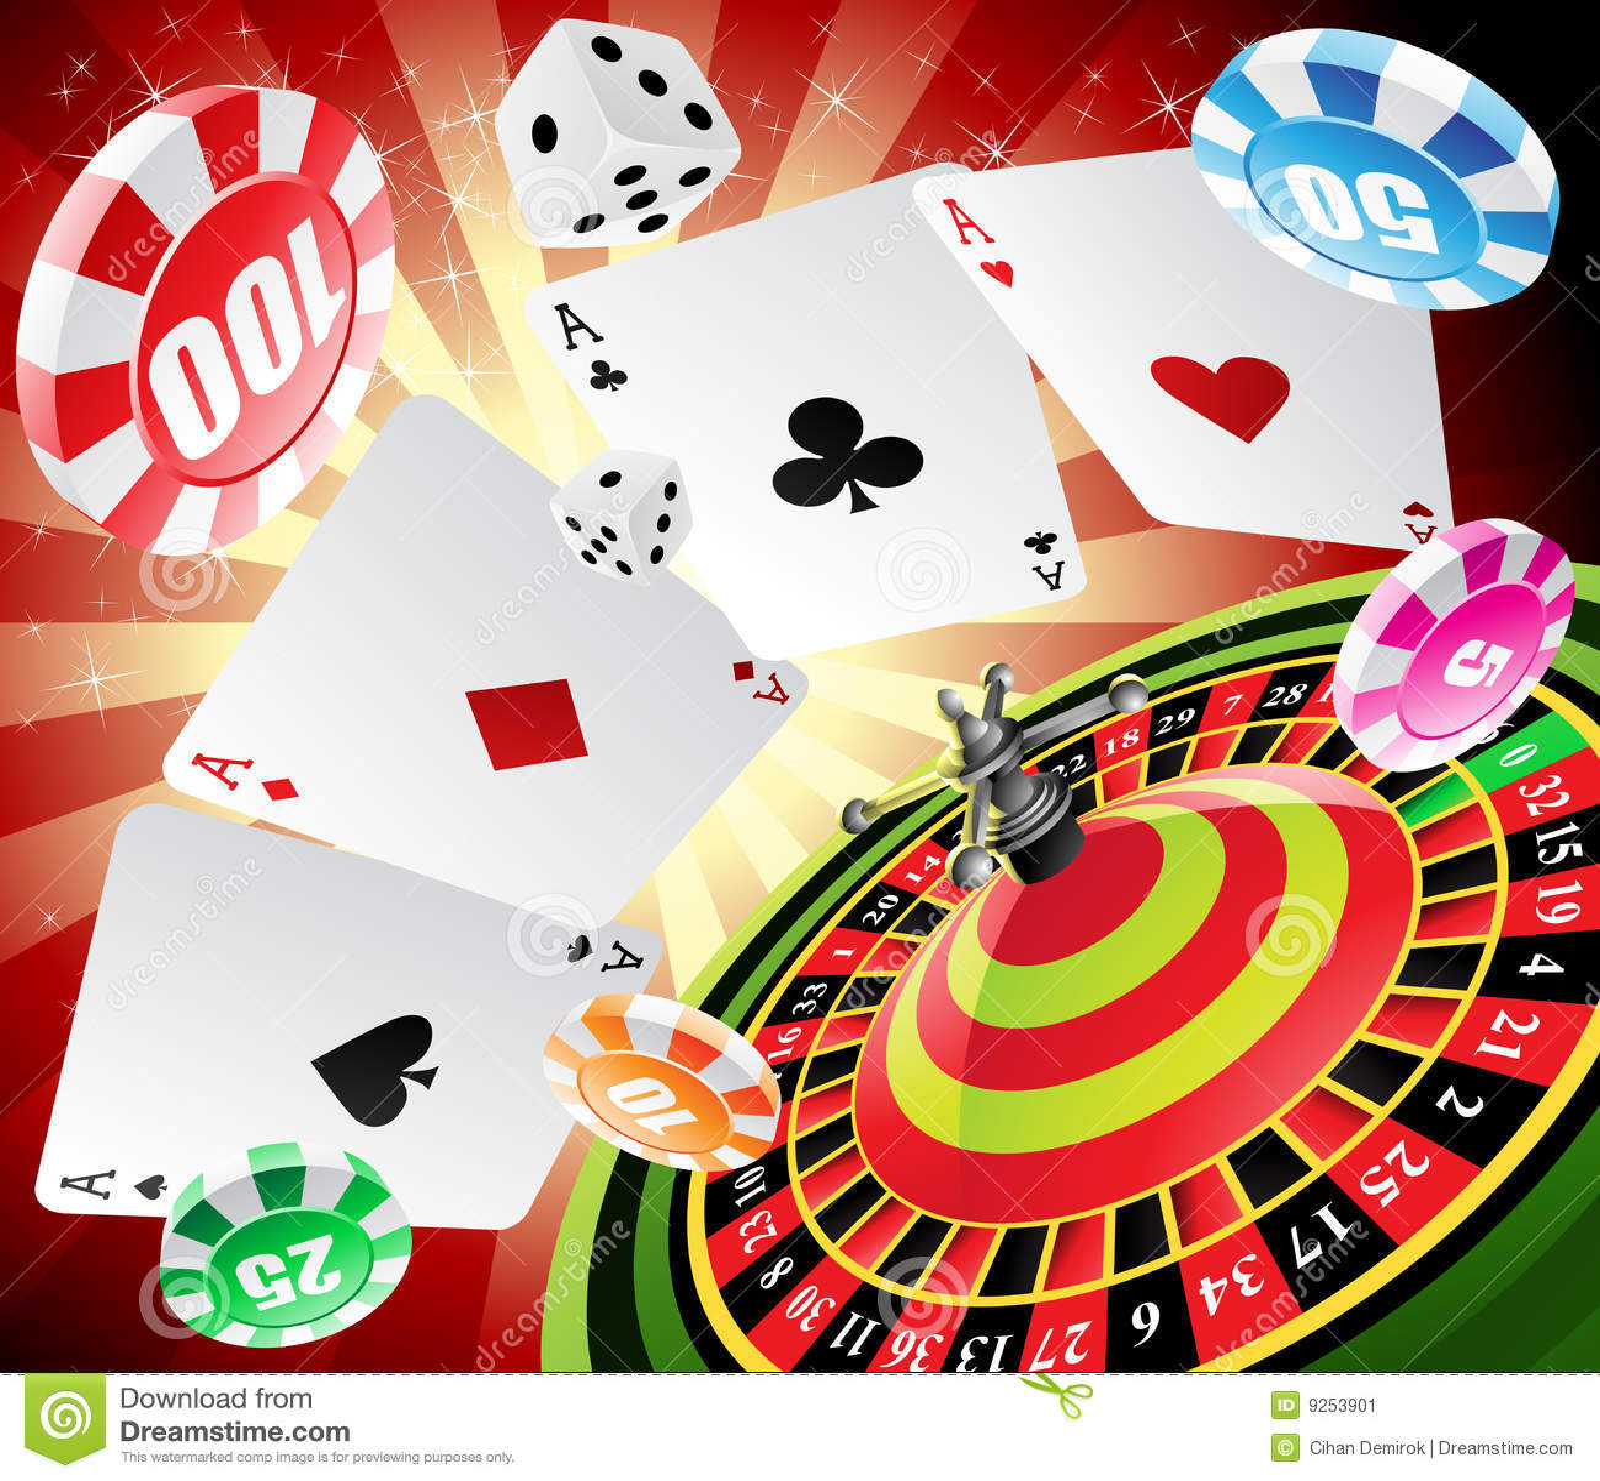 Игры бизнес онлайн 2018  Экономические онлайн игры бесплатно